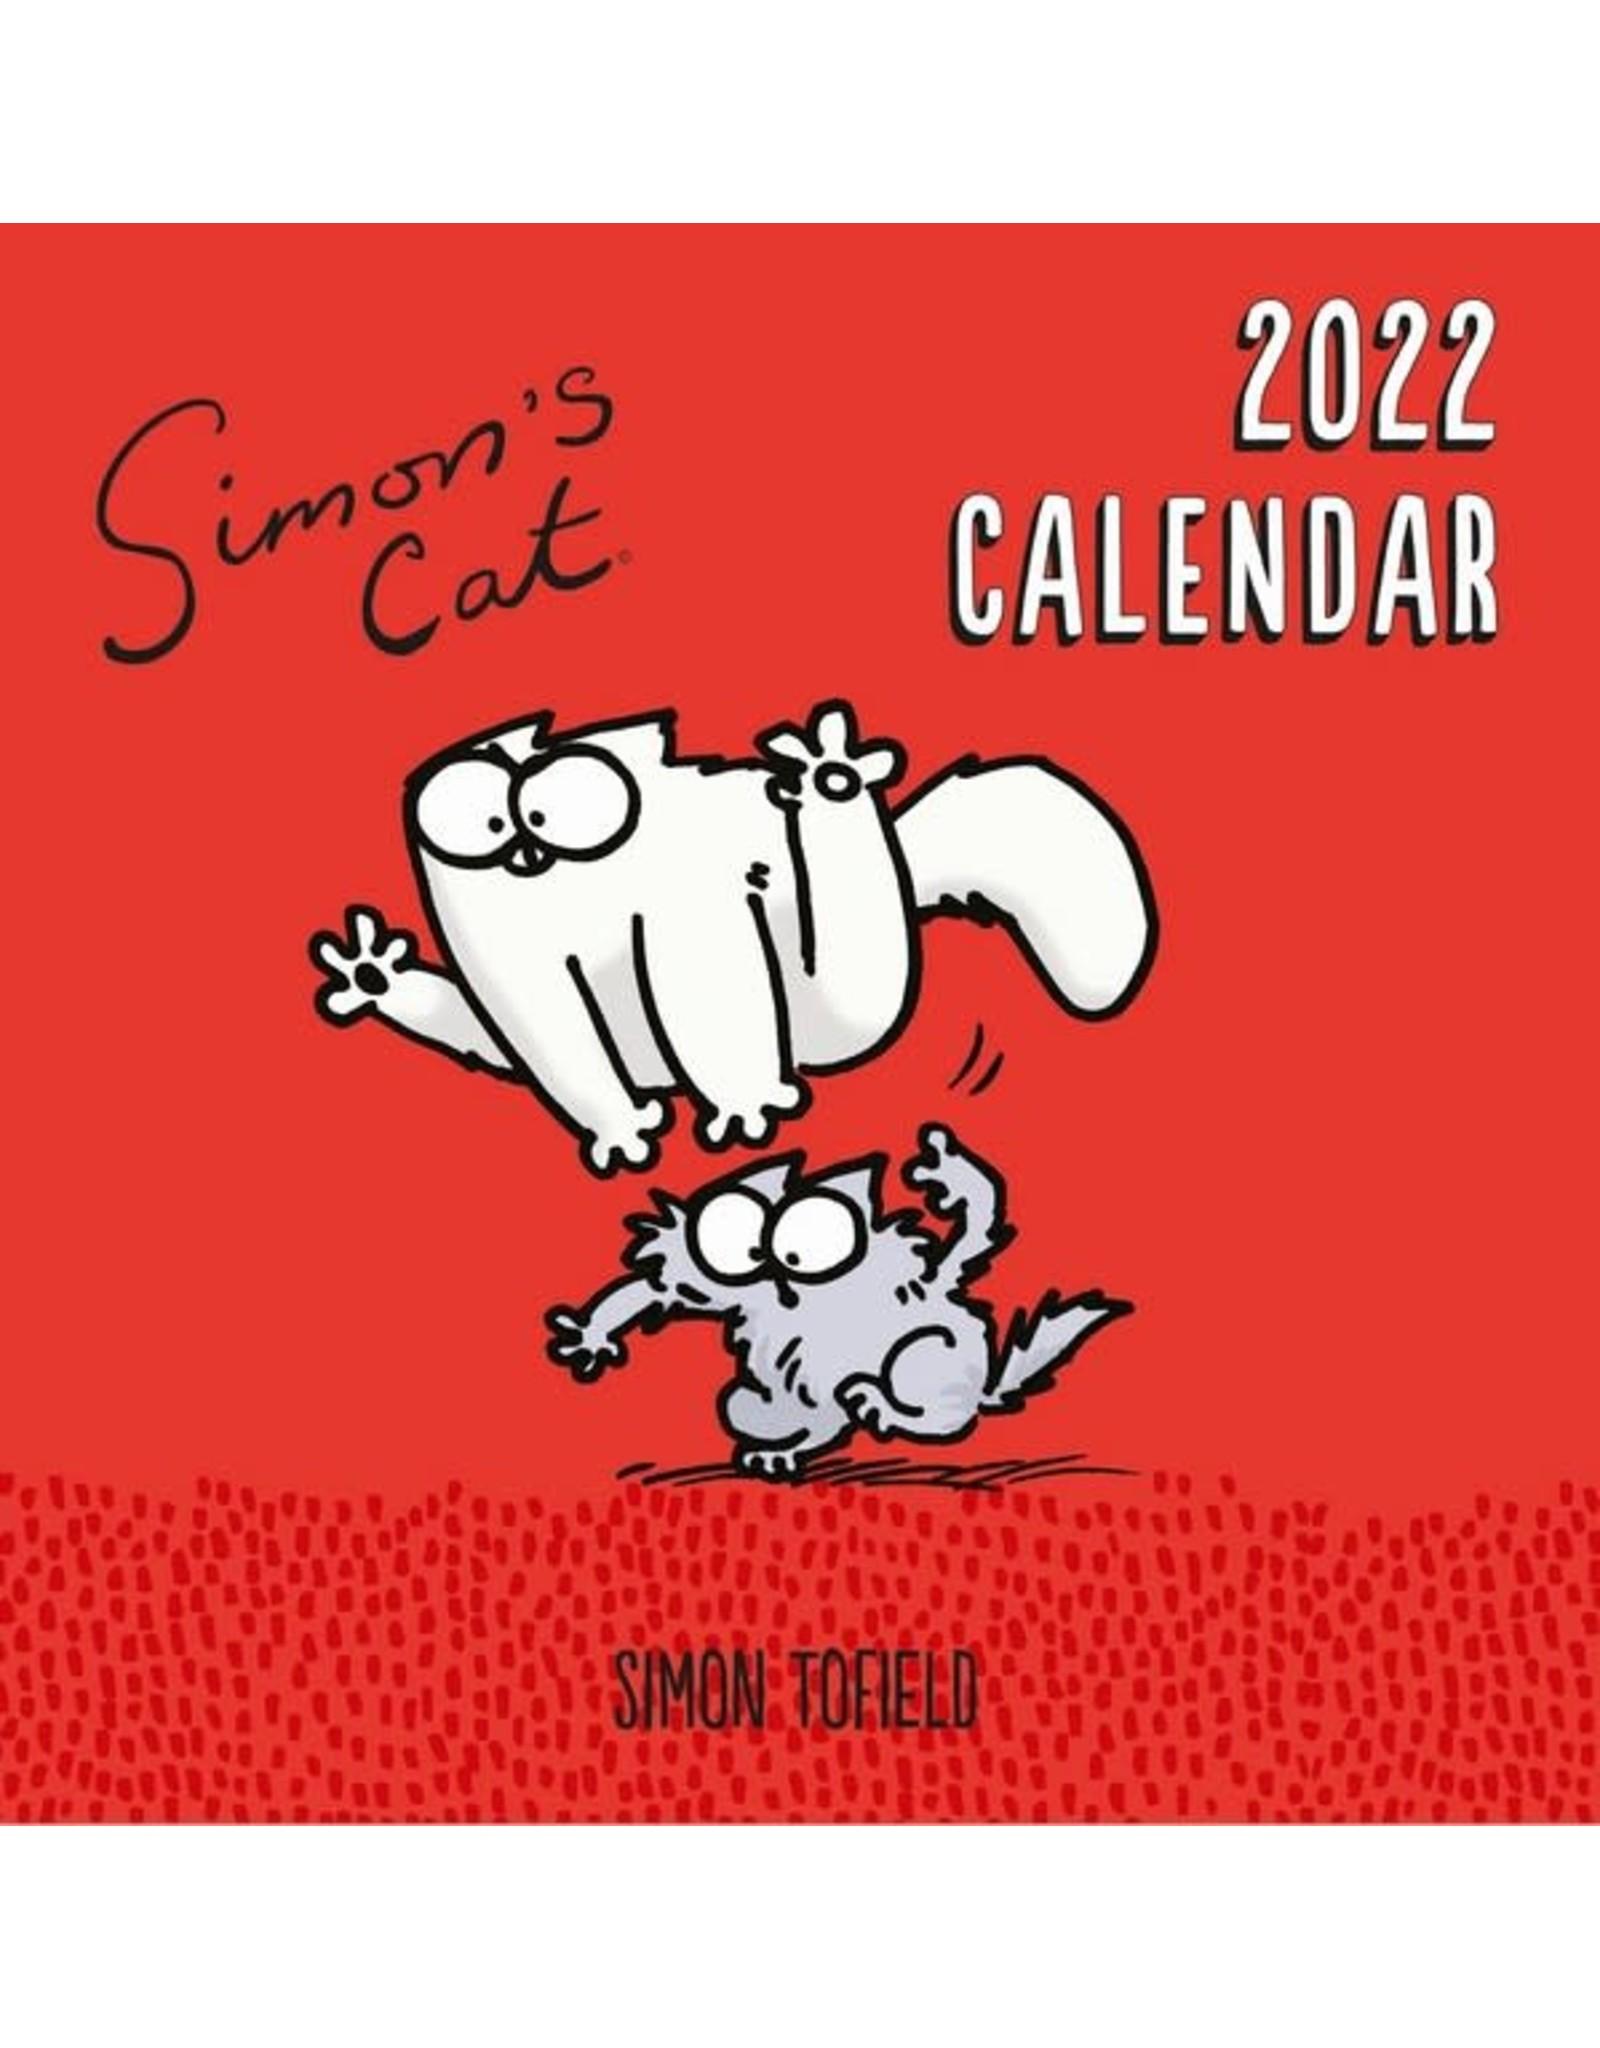 calendar 2022 of Simon the cat